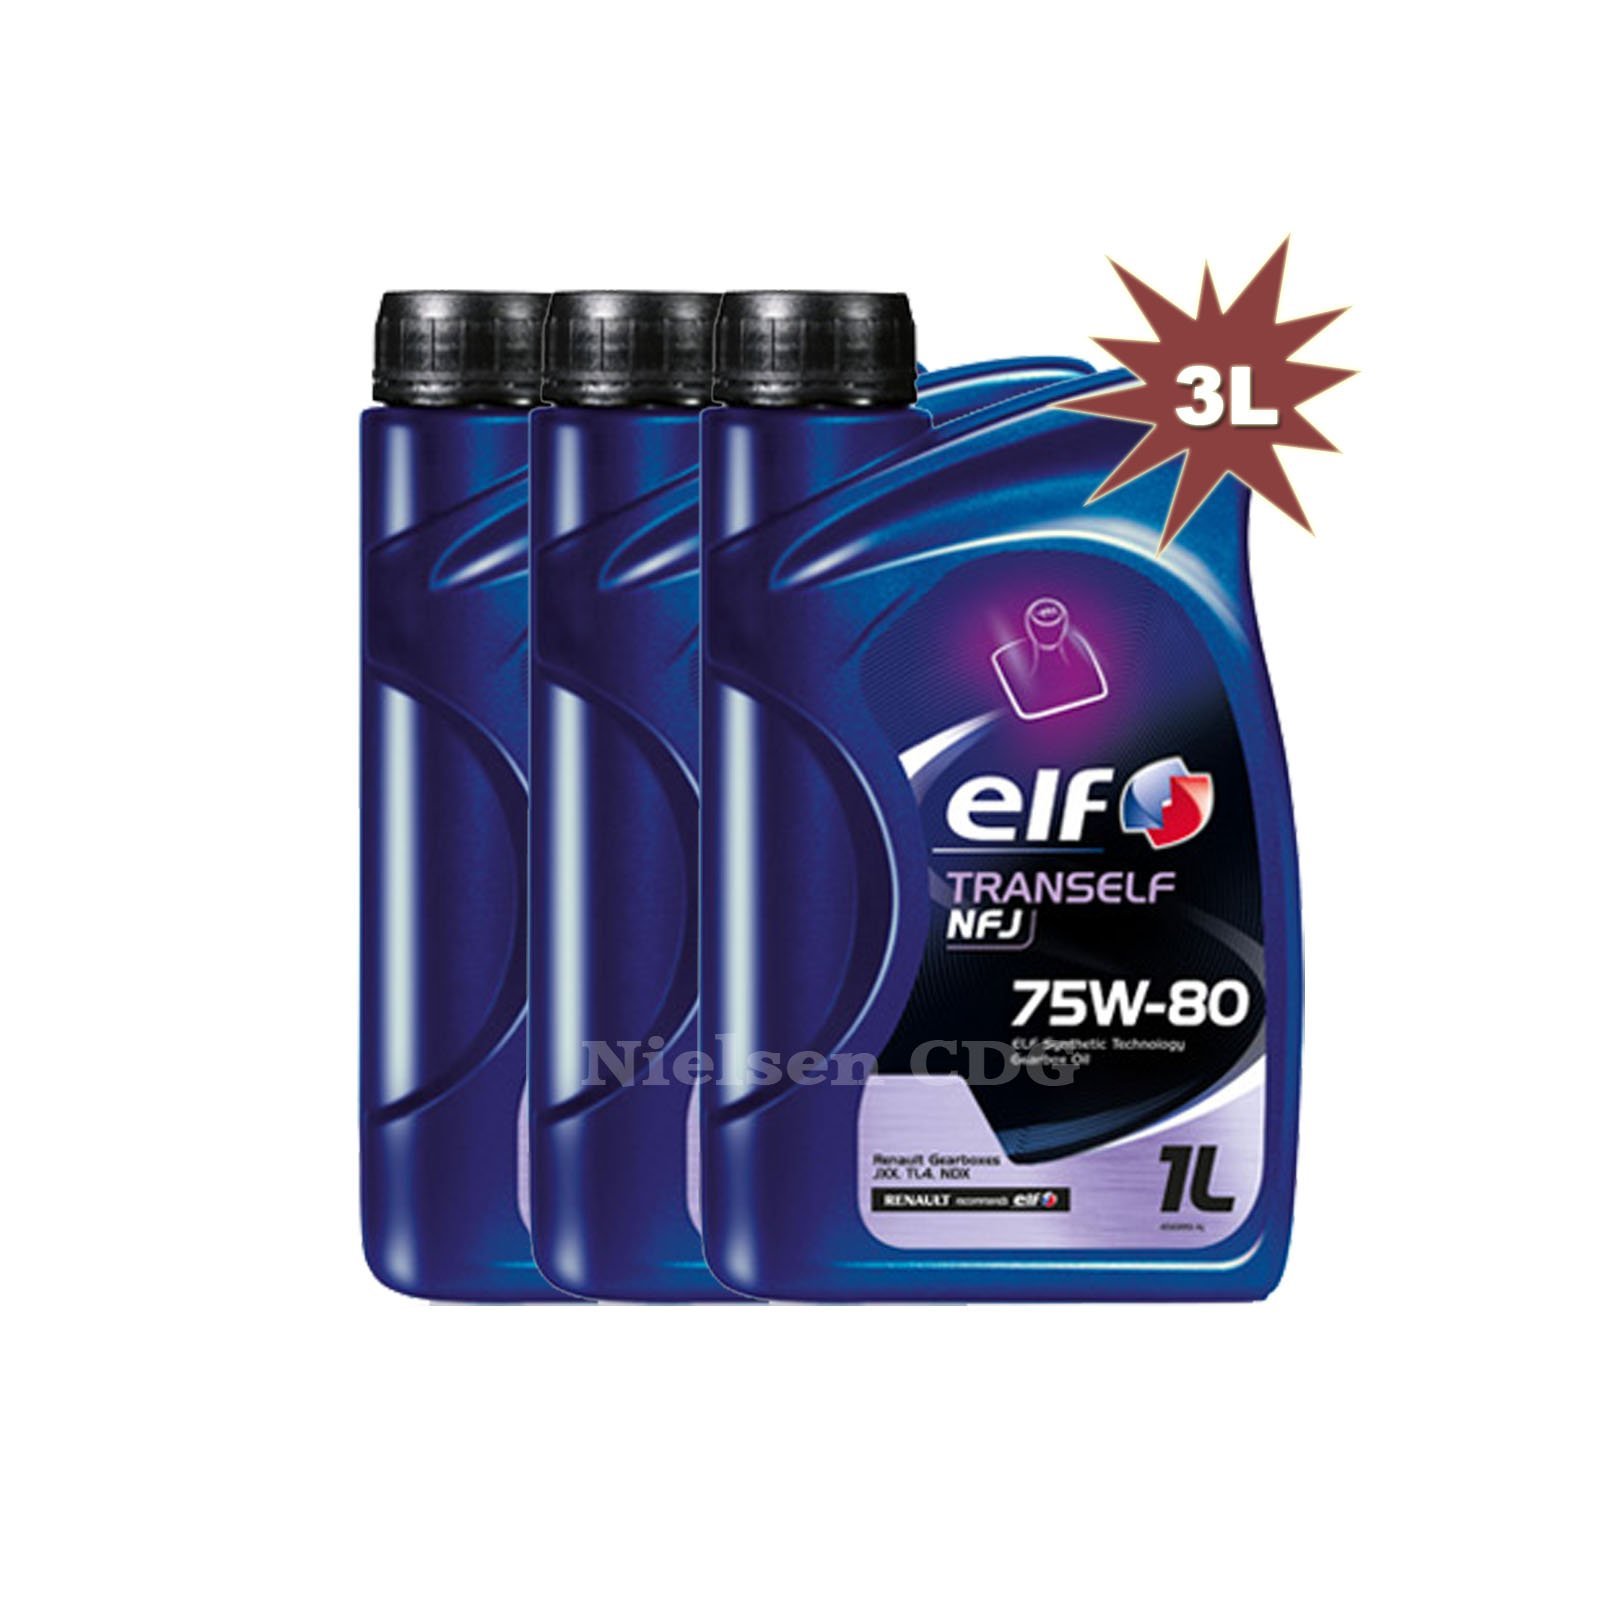 FwnThe Elf Company bateria Phone: Amazon.es: Electrónica